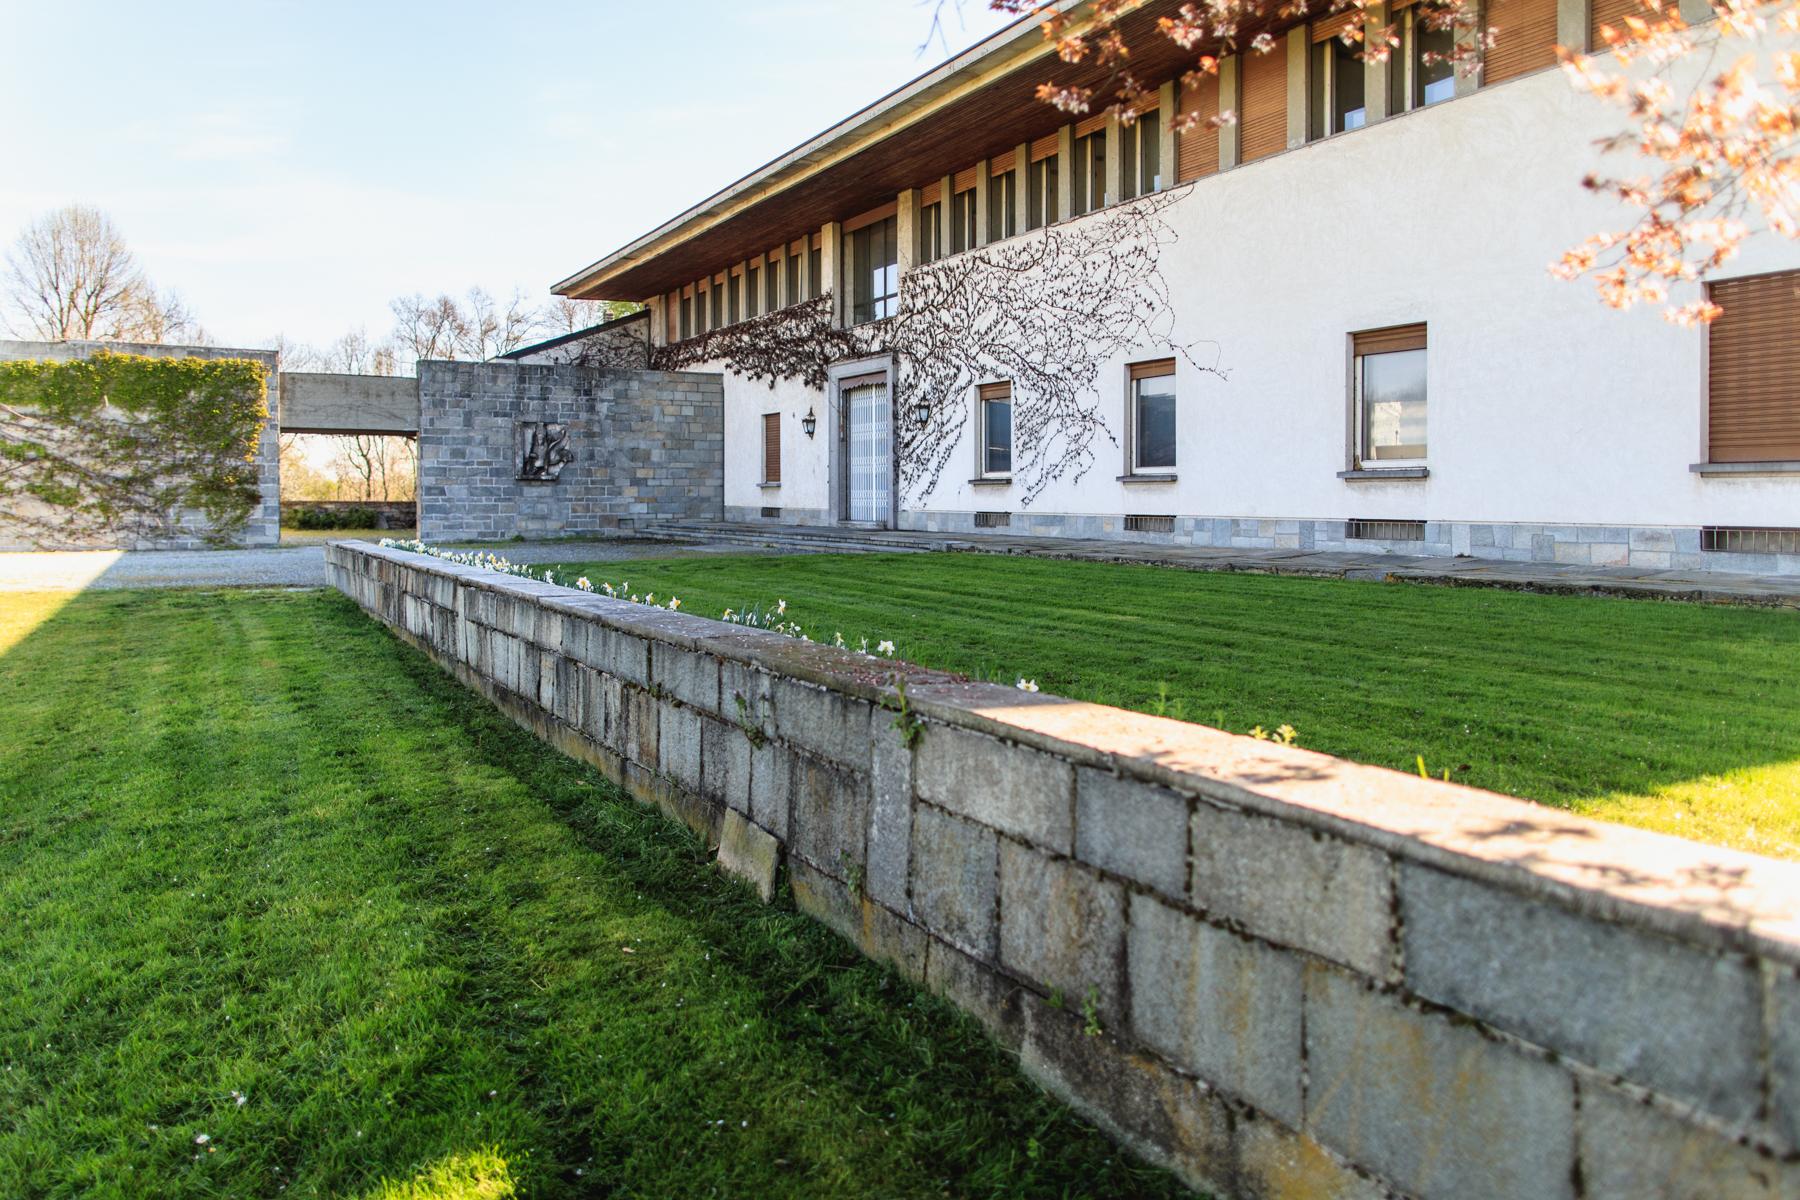 Casa indipendente in Vendita a Venaria: 5 locali, 1000 mq - Foto 9